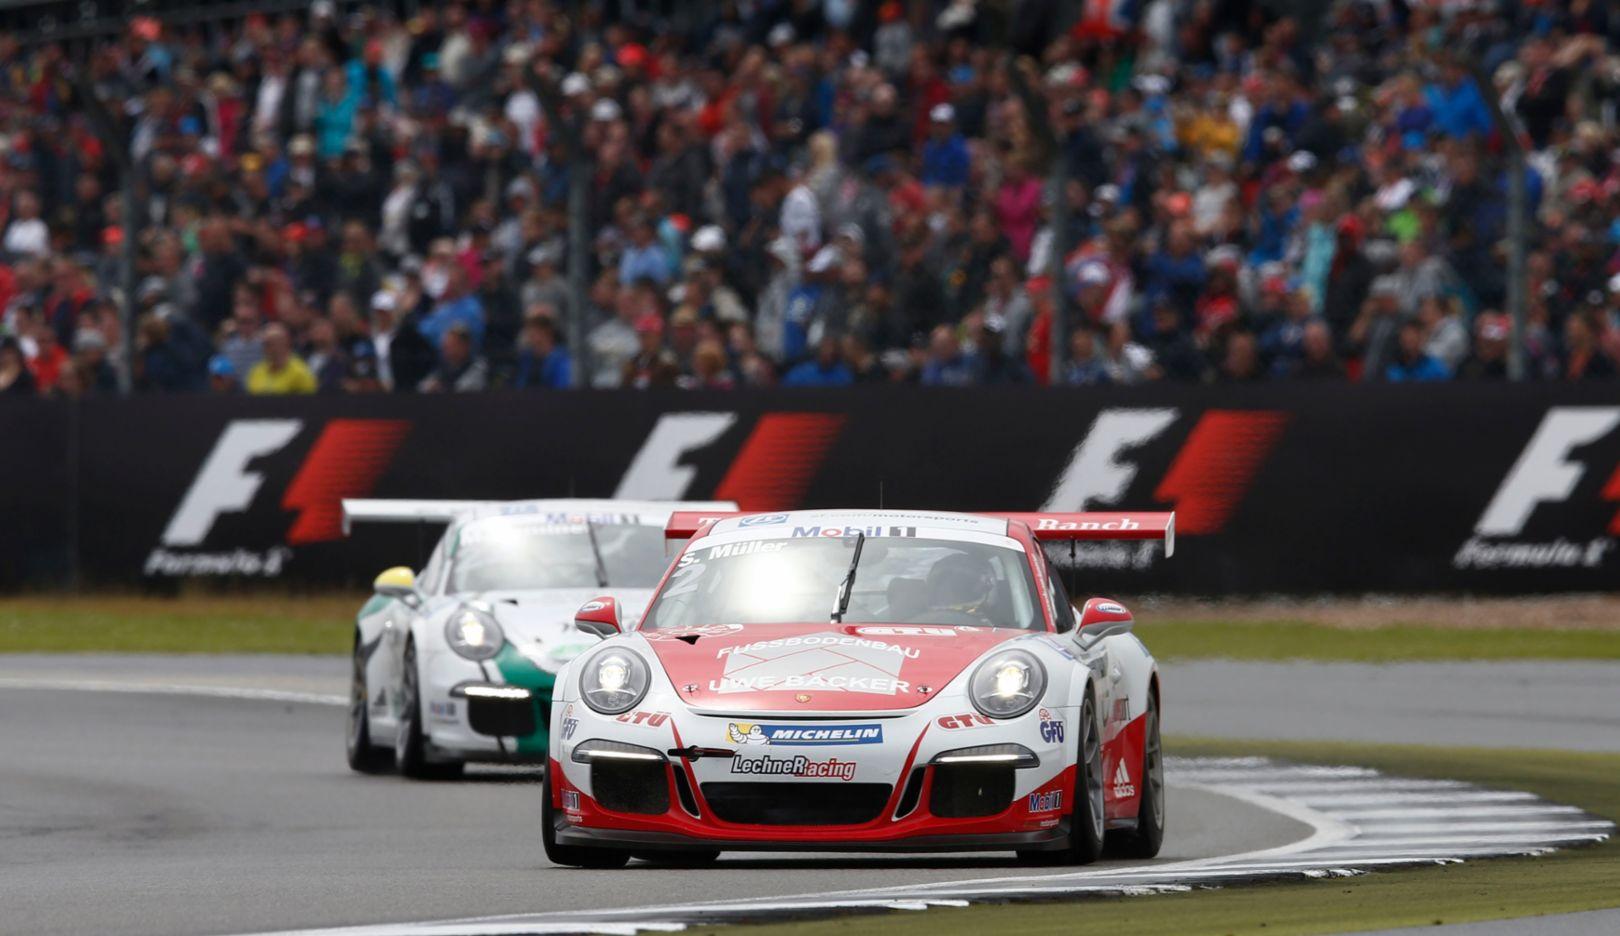 911 GT3 Cup, Porsche Mobil 1 Supercup, Silverstone, 2016, Porsche AG